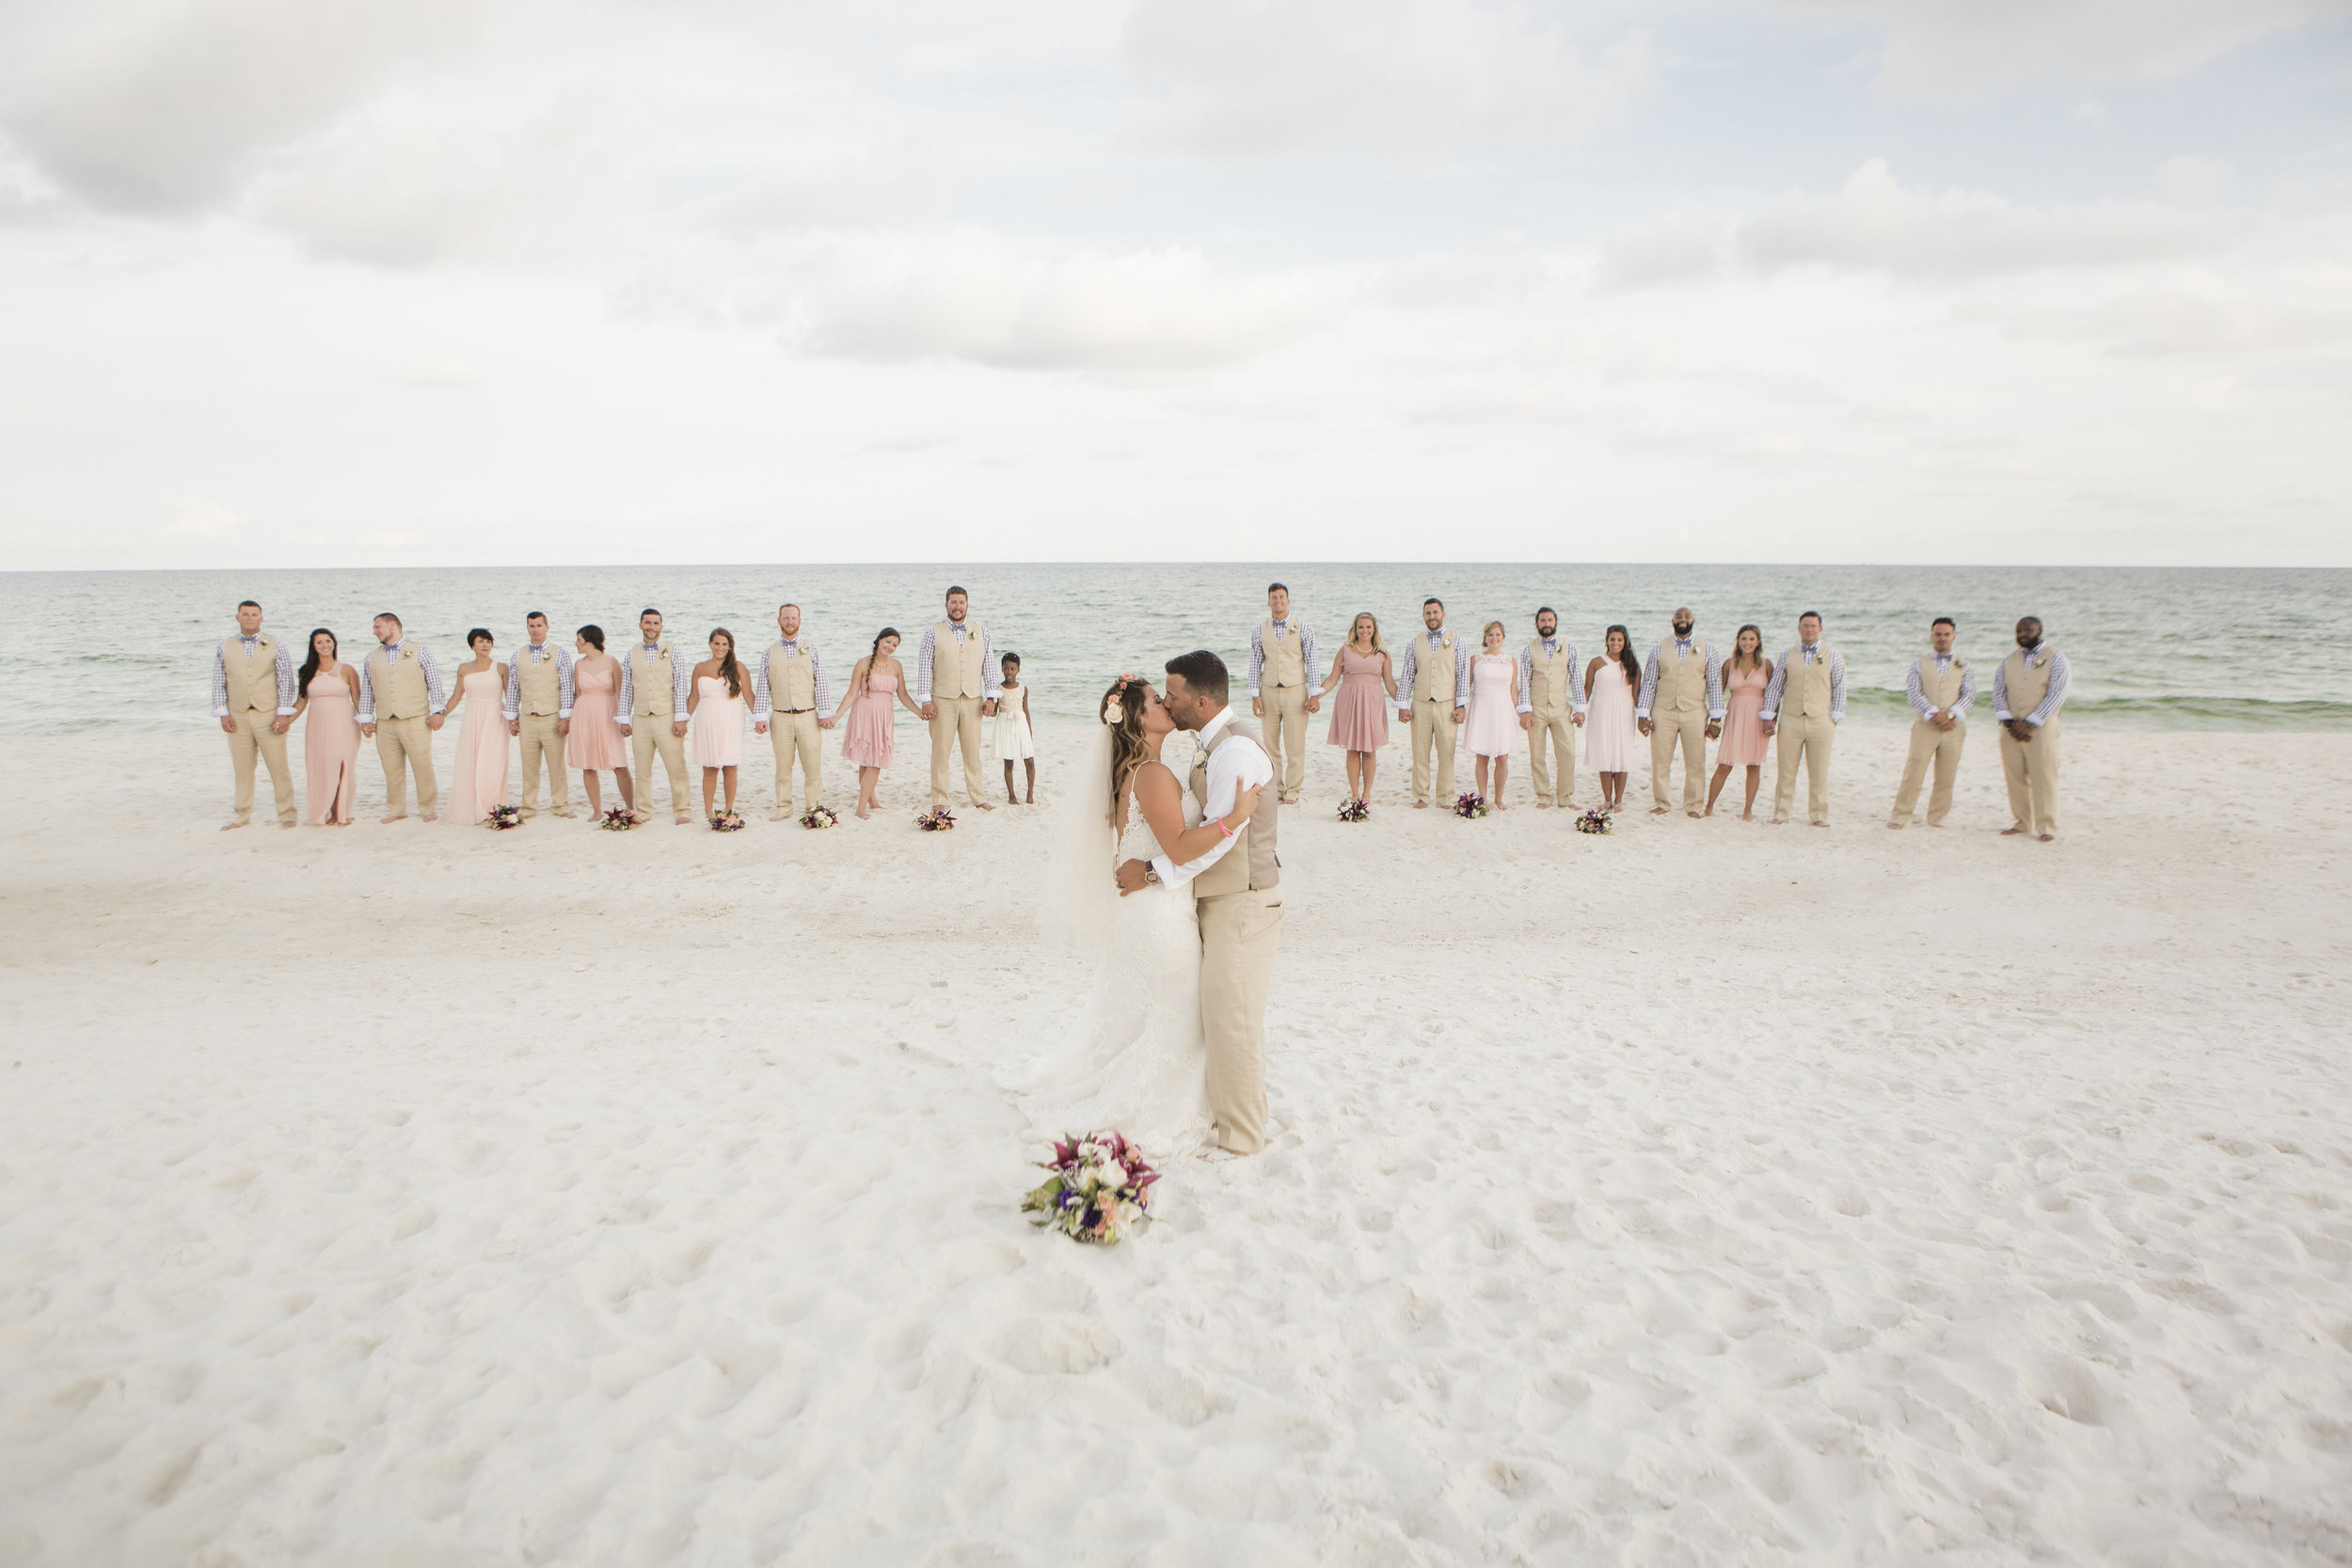 Blush Bohemian Beach wedding - Aislinn Kate Photography + Grace and Serendipity